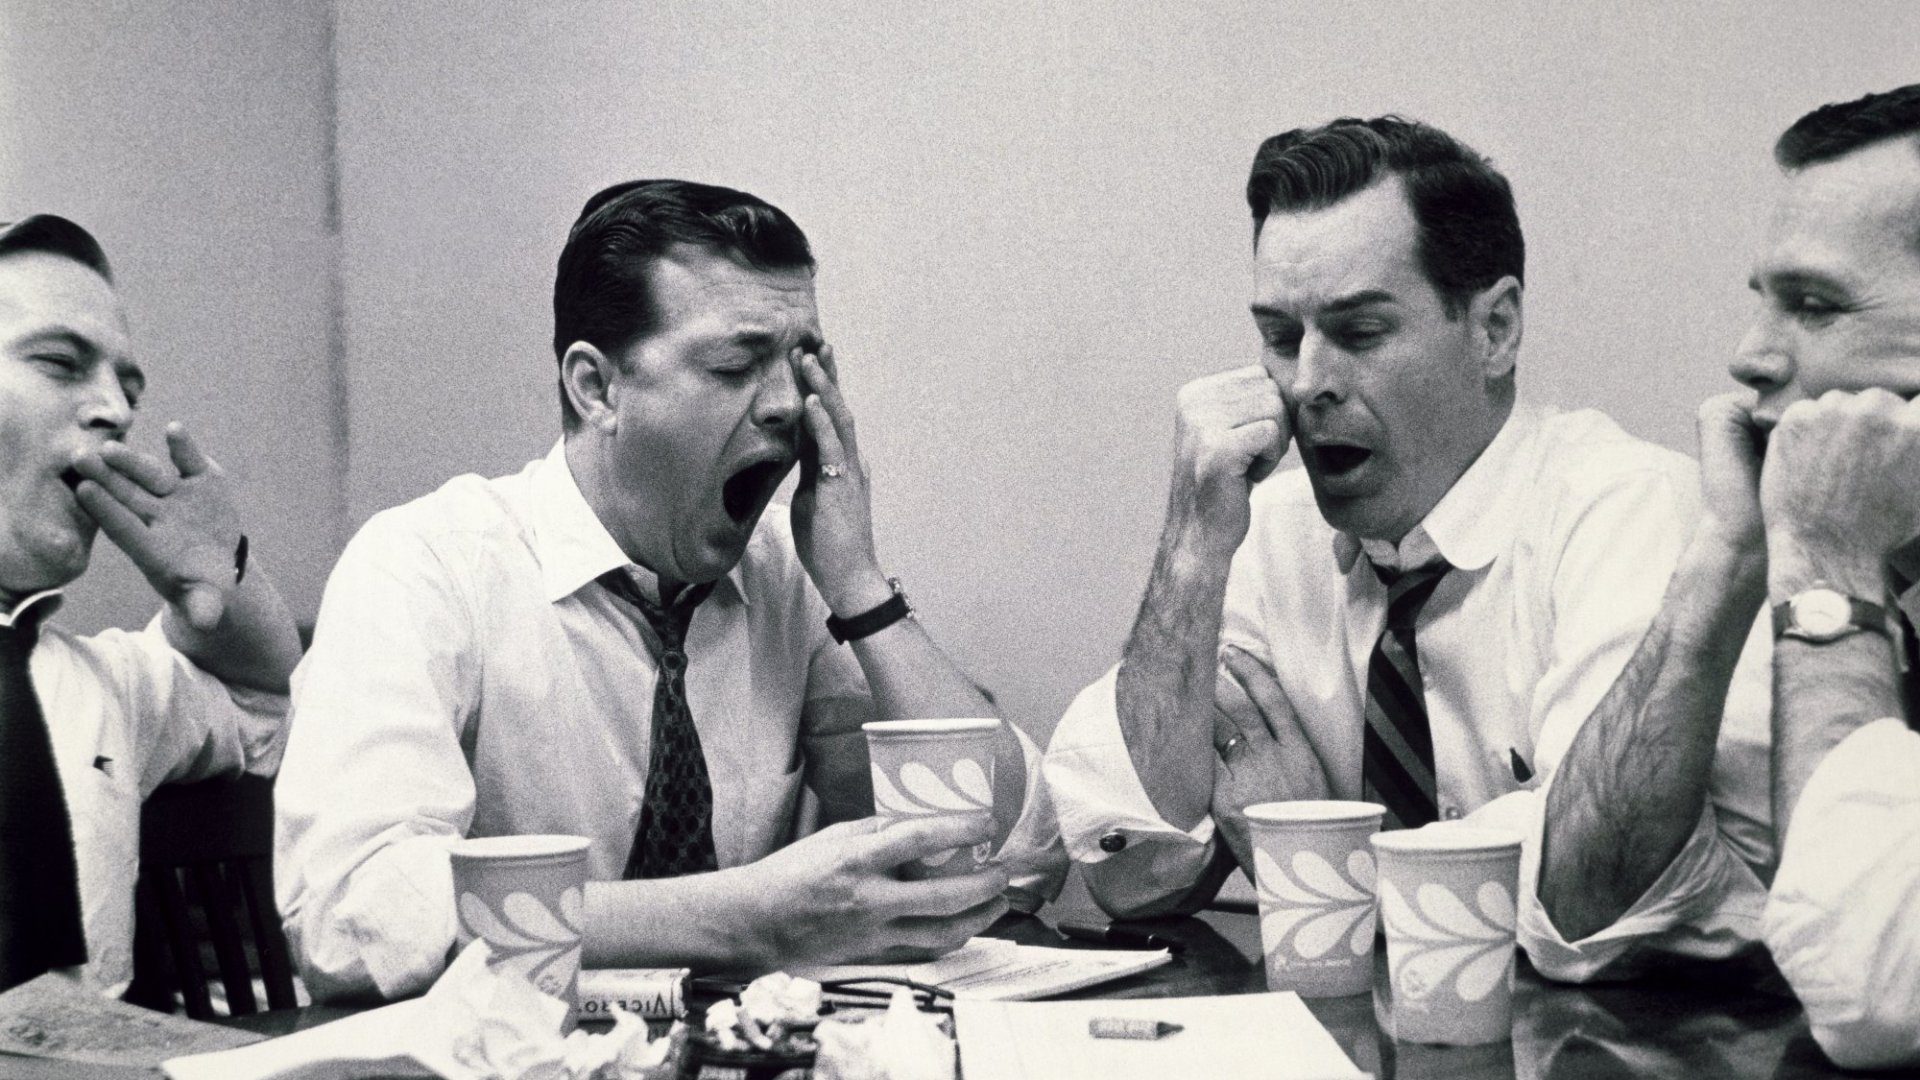 3 Ways to Run a Terrible Meeting